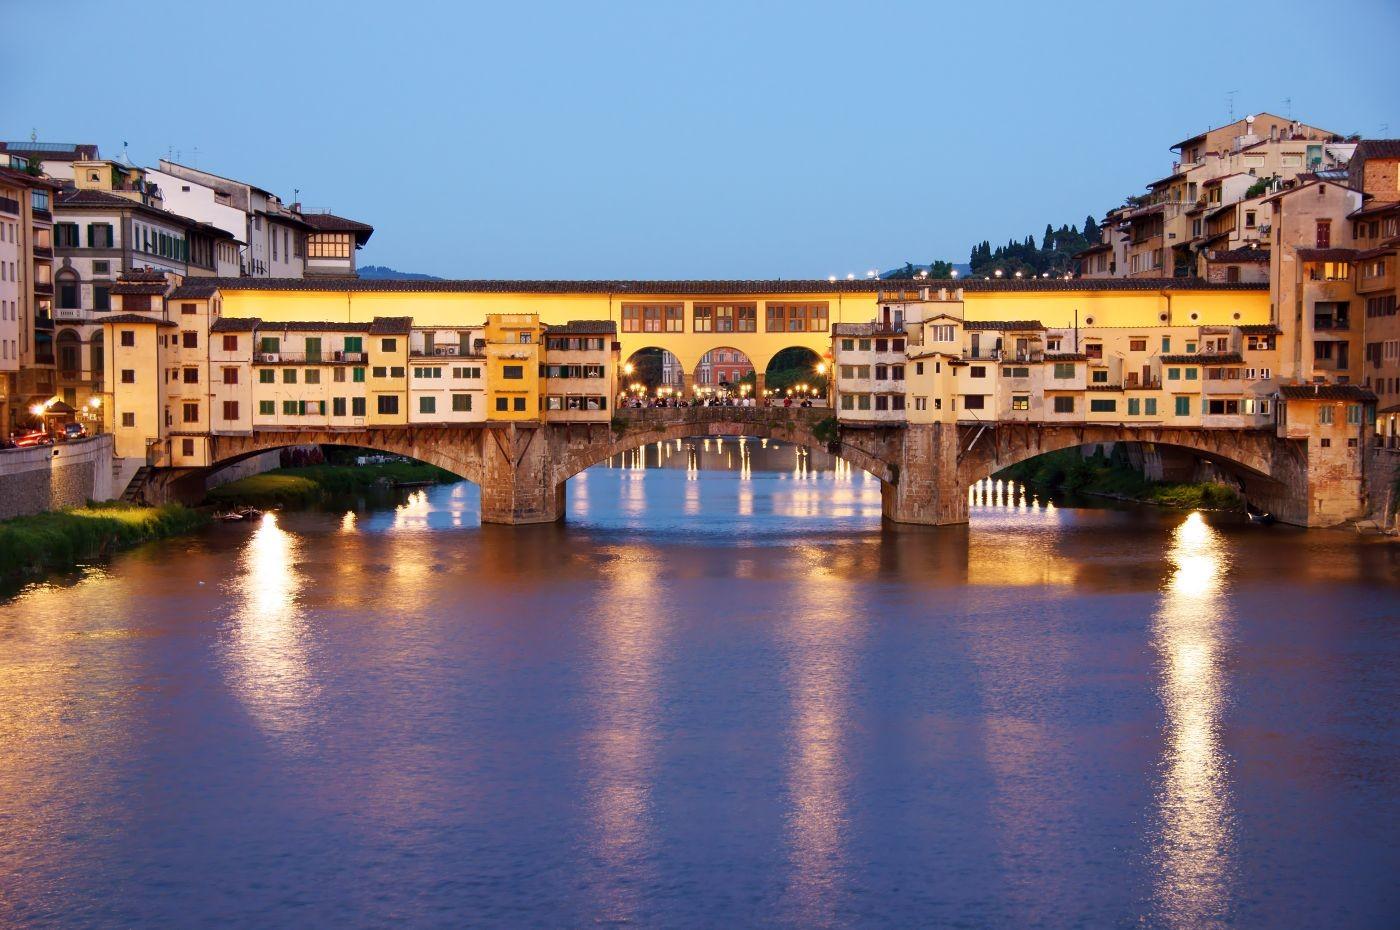 Super Expérience à Florence, Italie par Mélissa | Expérience Erasmus  UU17